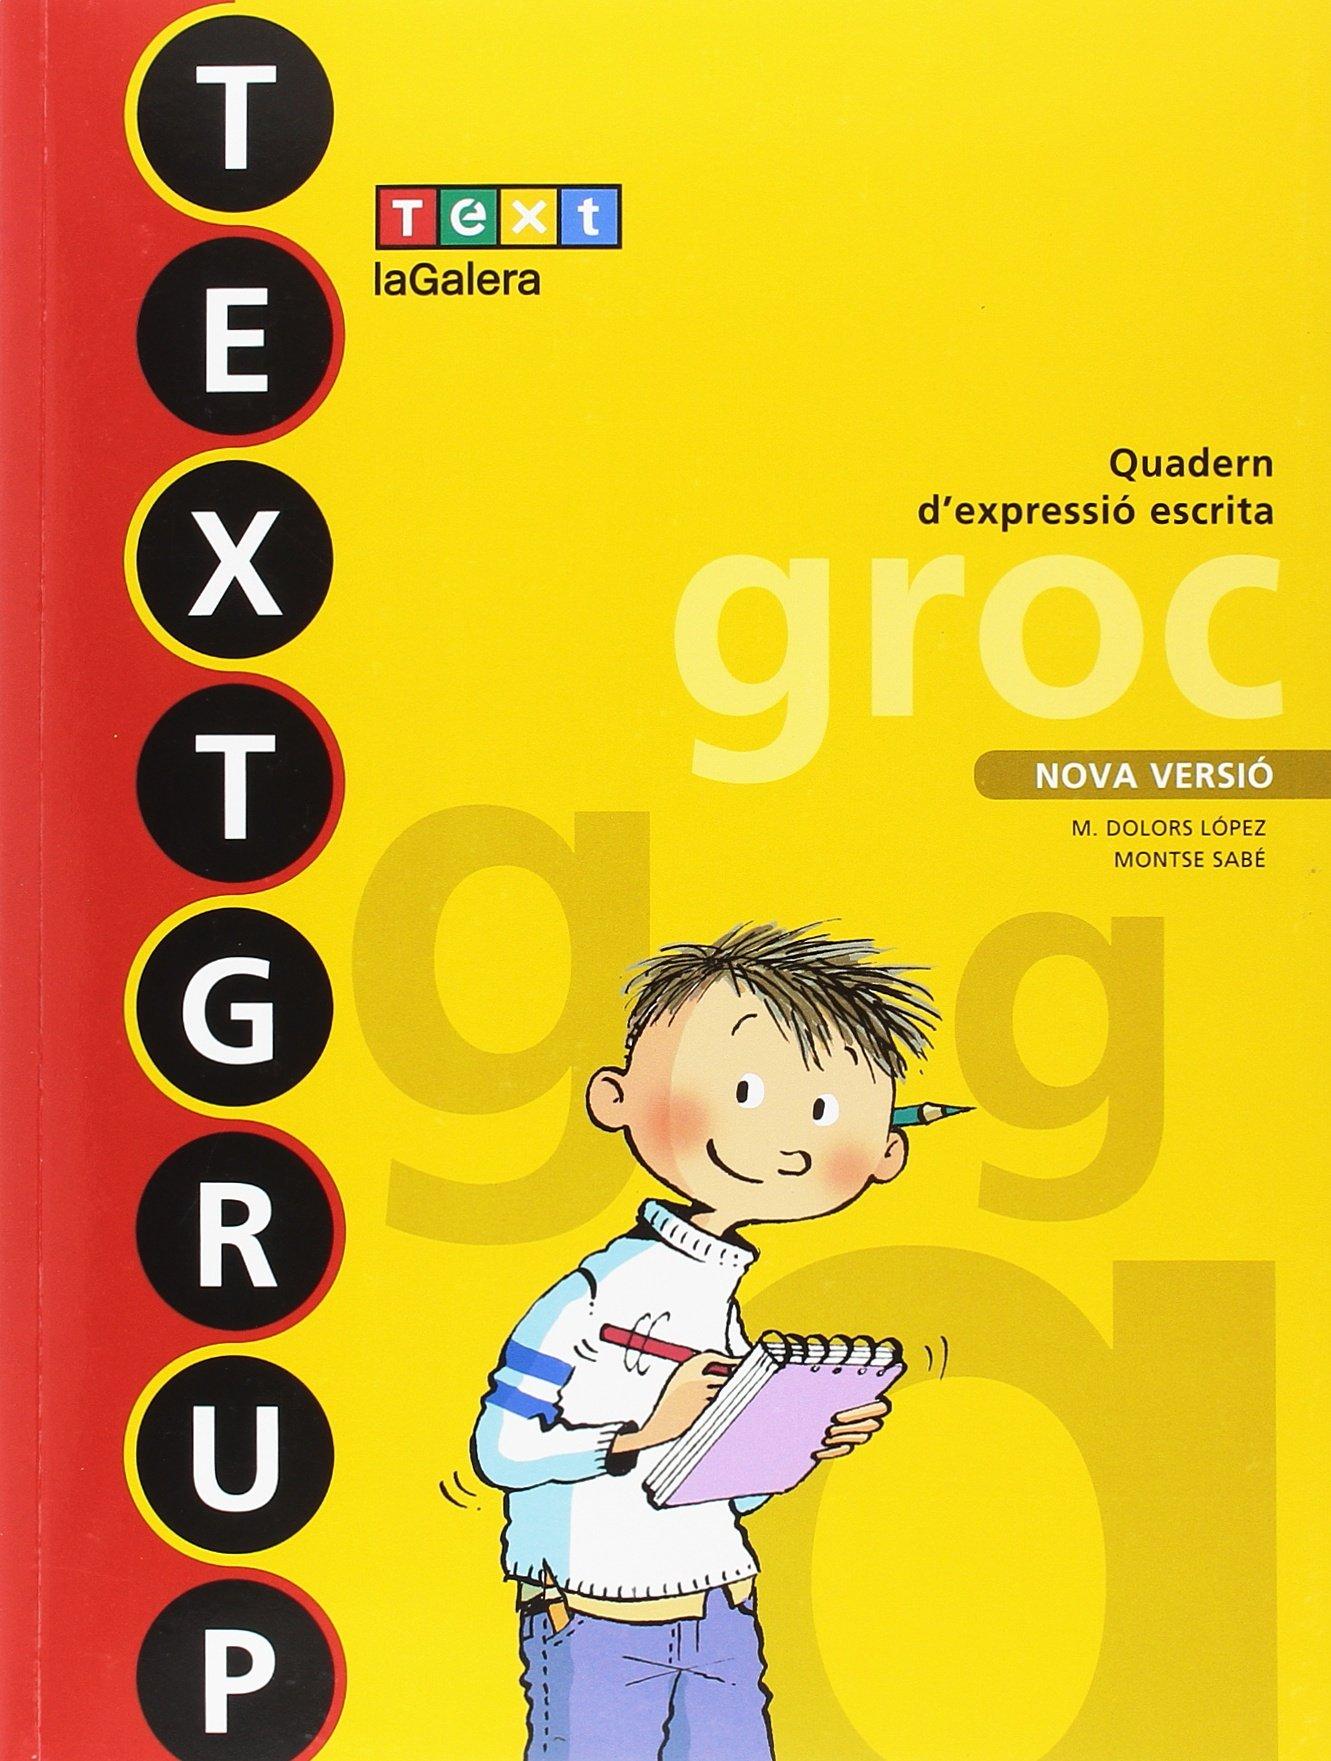 Textgrup groc Ed. 2018 (Textgrup-Quadern d'expressió escrita) (Catalán) Tapa blanda – 1 jul 2018 M. Dolors López Gutierrez Montse Sabé Pou Text-la Galera 8441231443